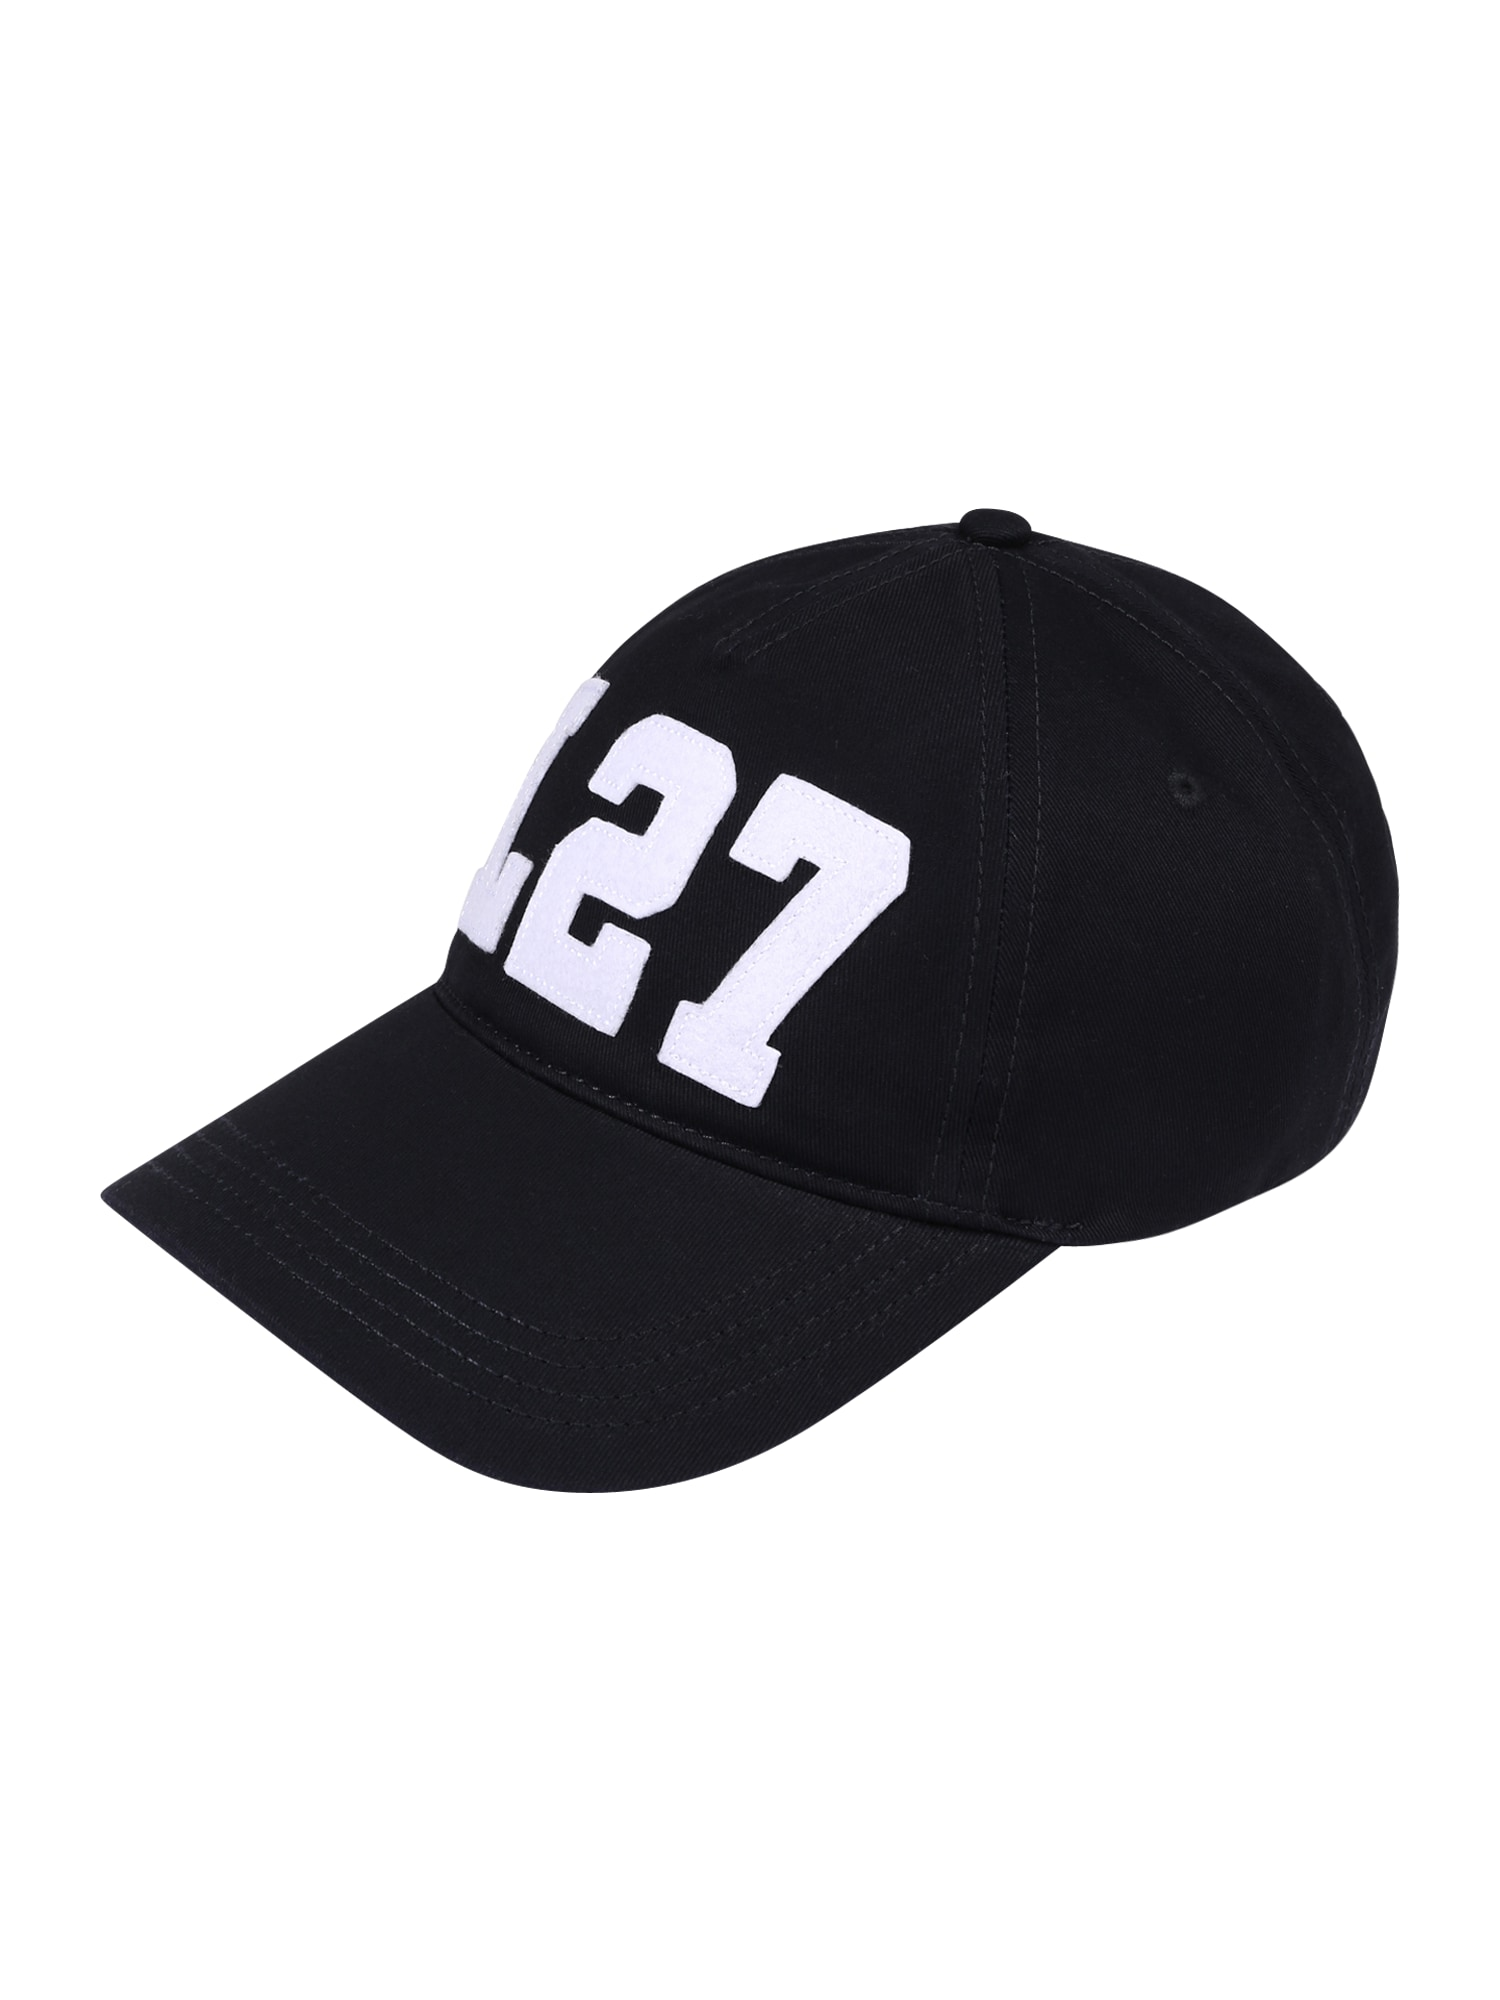 LACOSTE Kepurė juoda / balta